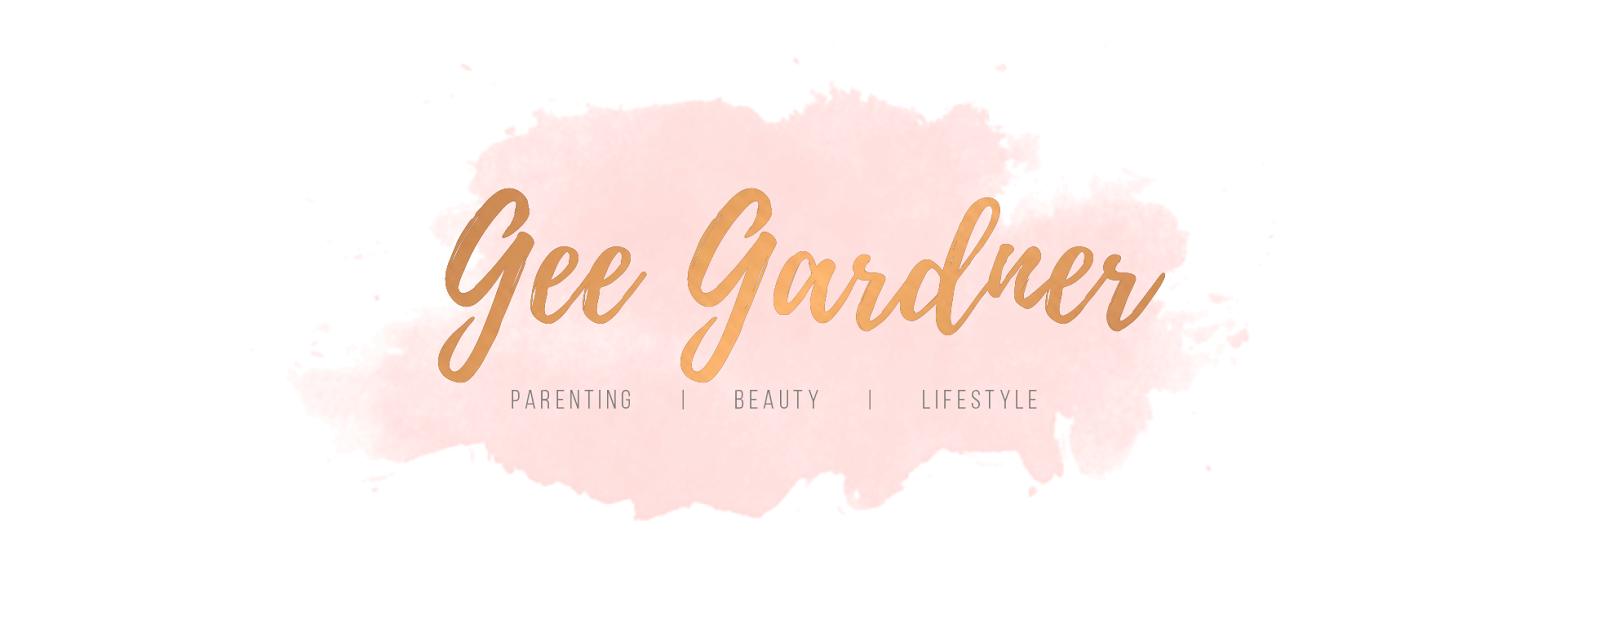 Gee Gardner - Parenting, Beauty & Lifestyle Blog